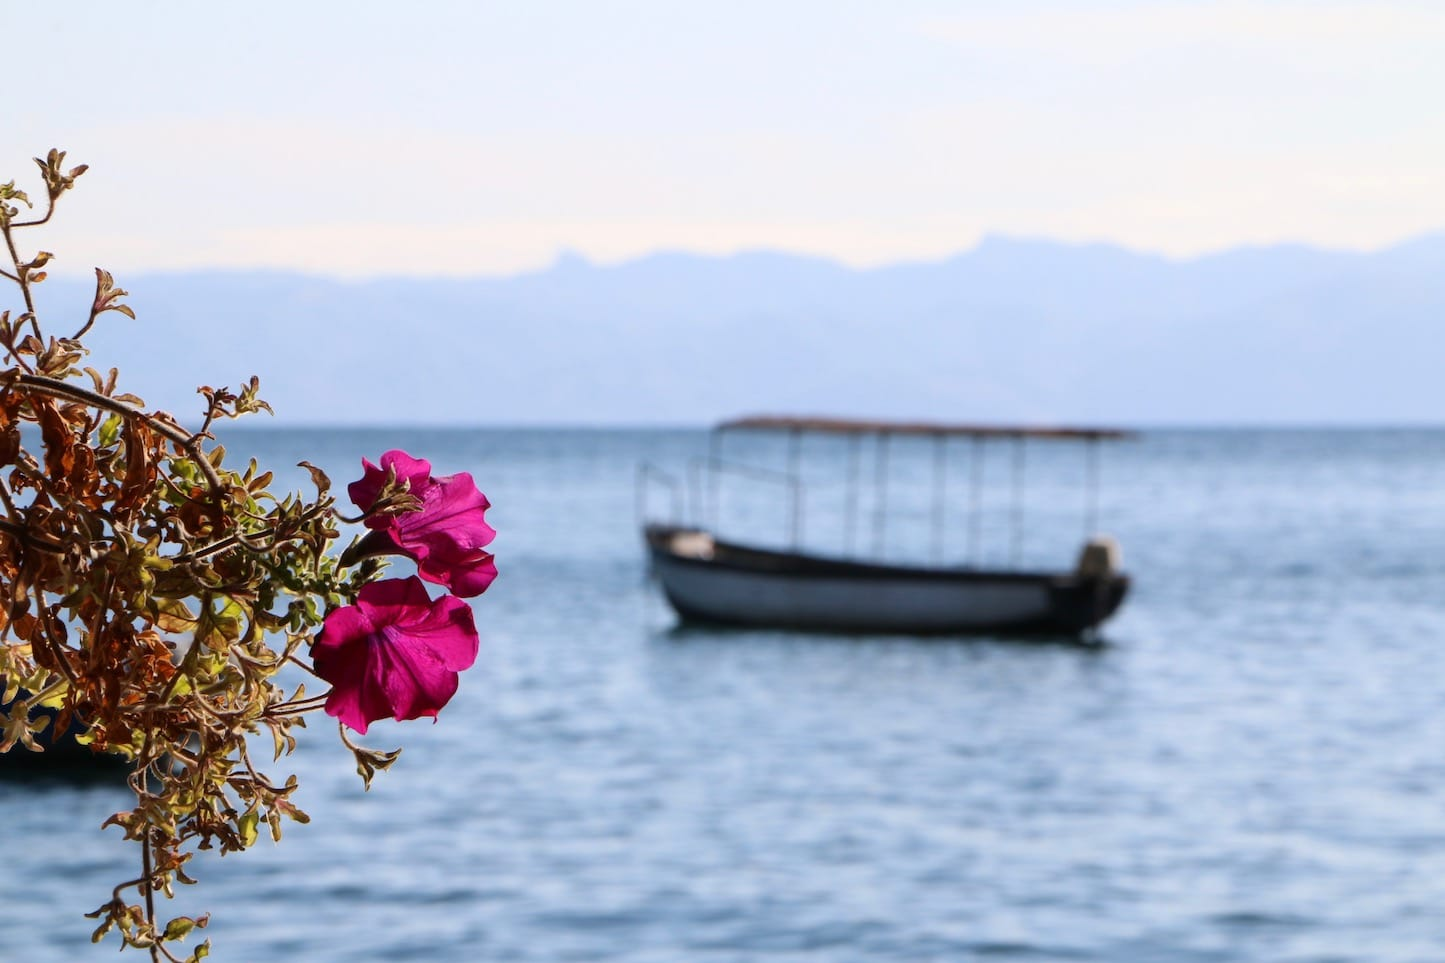 Lake Ohrid view